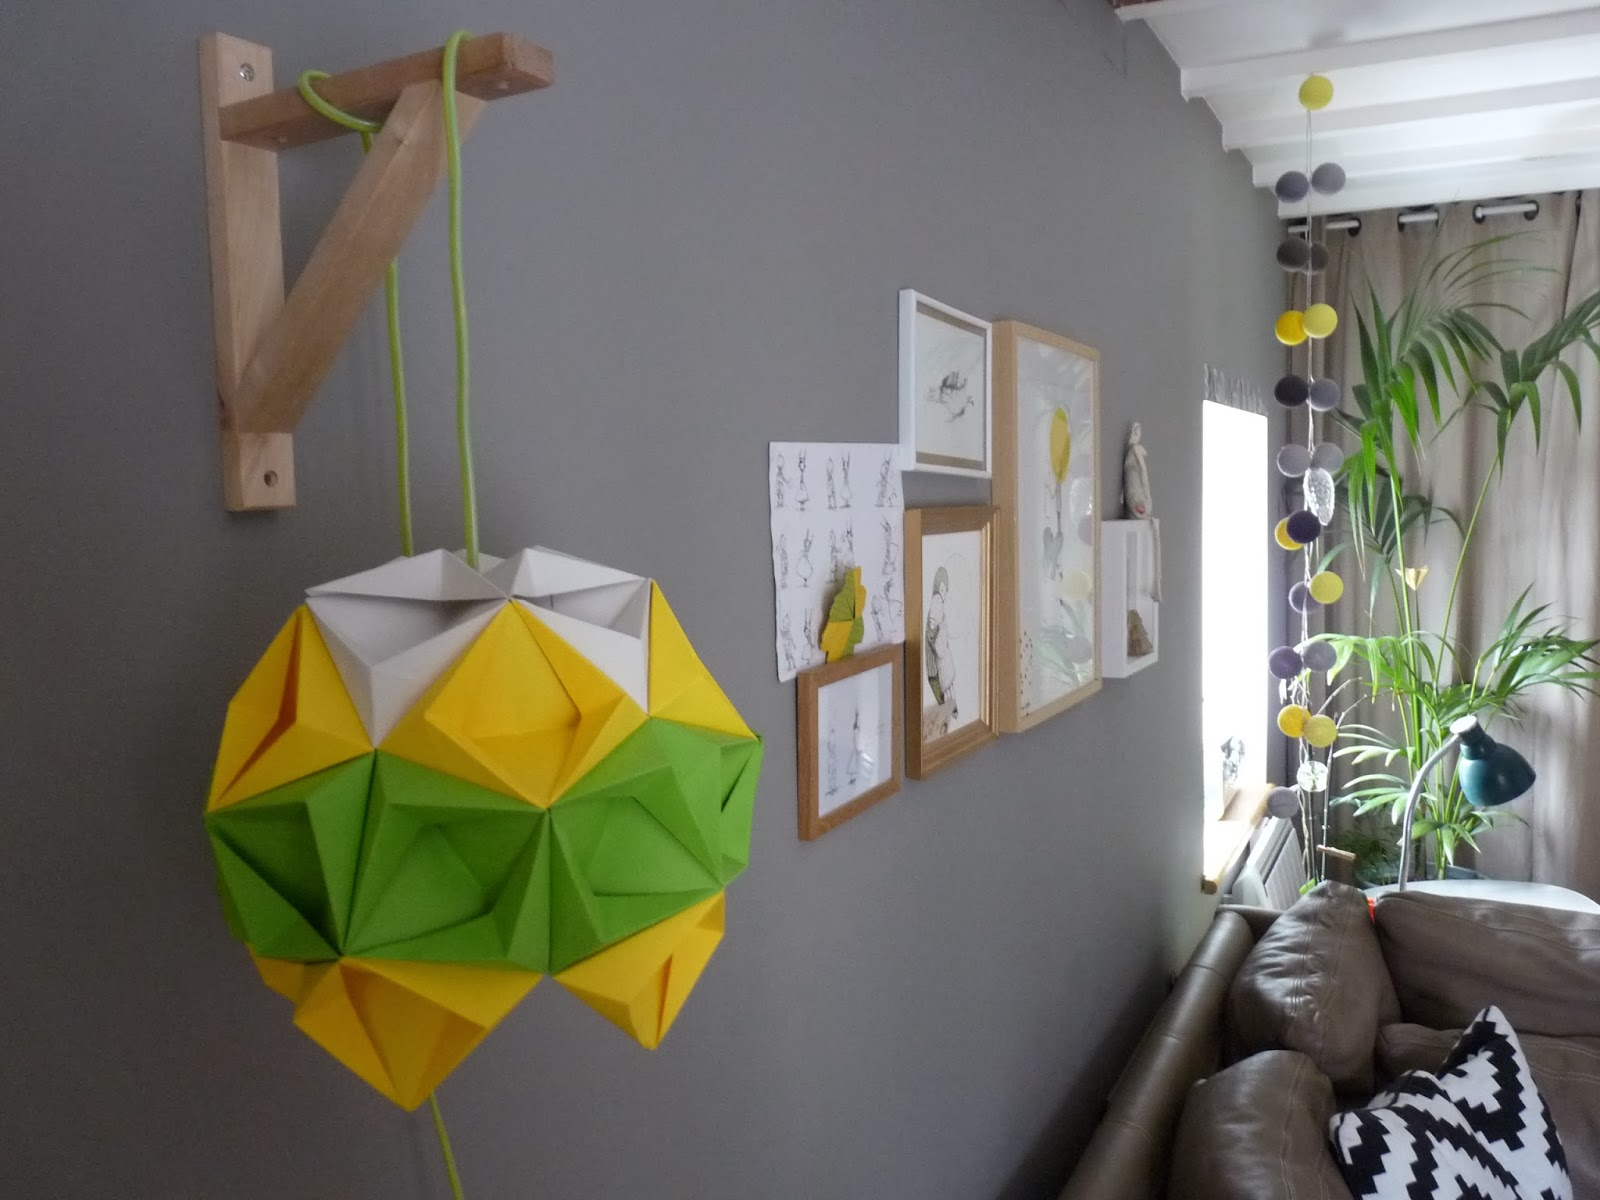 rue rivoirette diy ma lampe origami. Black Bedroom Furniture Sets. Home Design Ideas